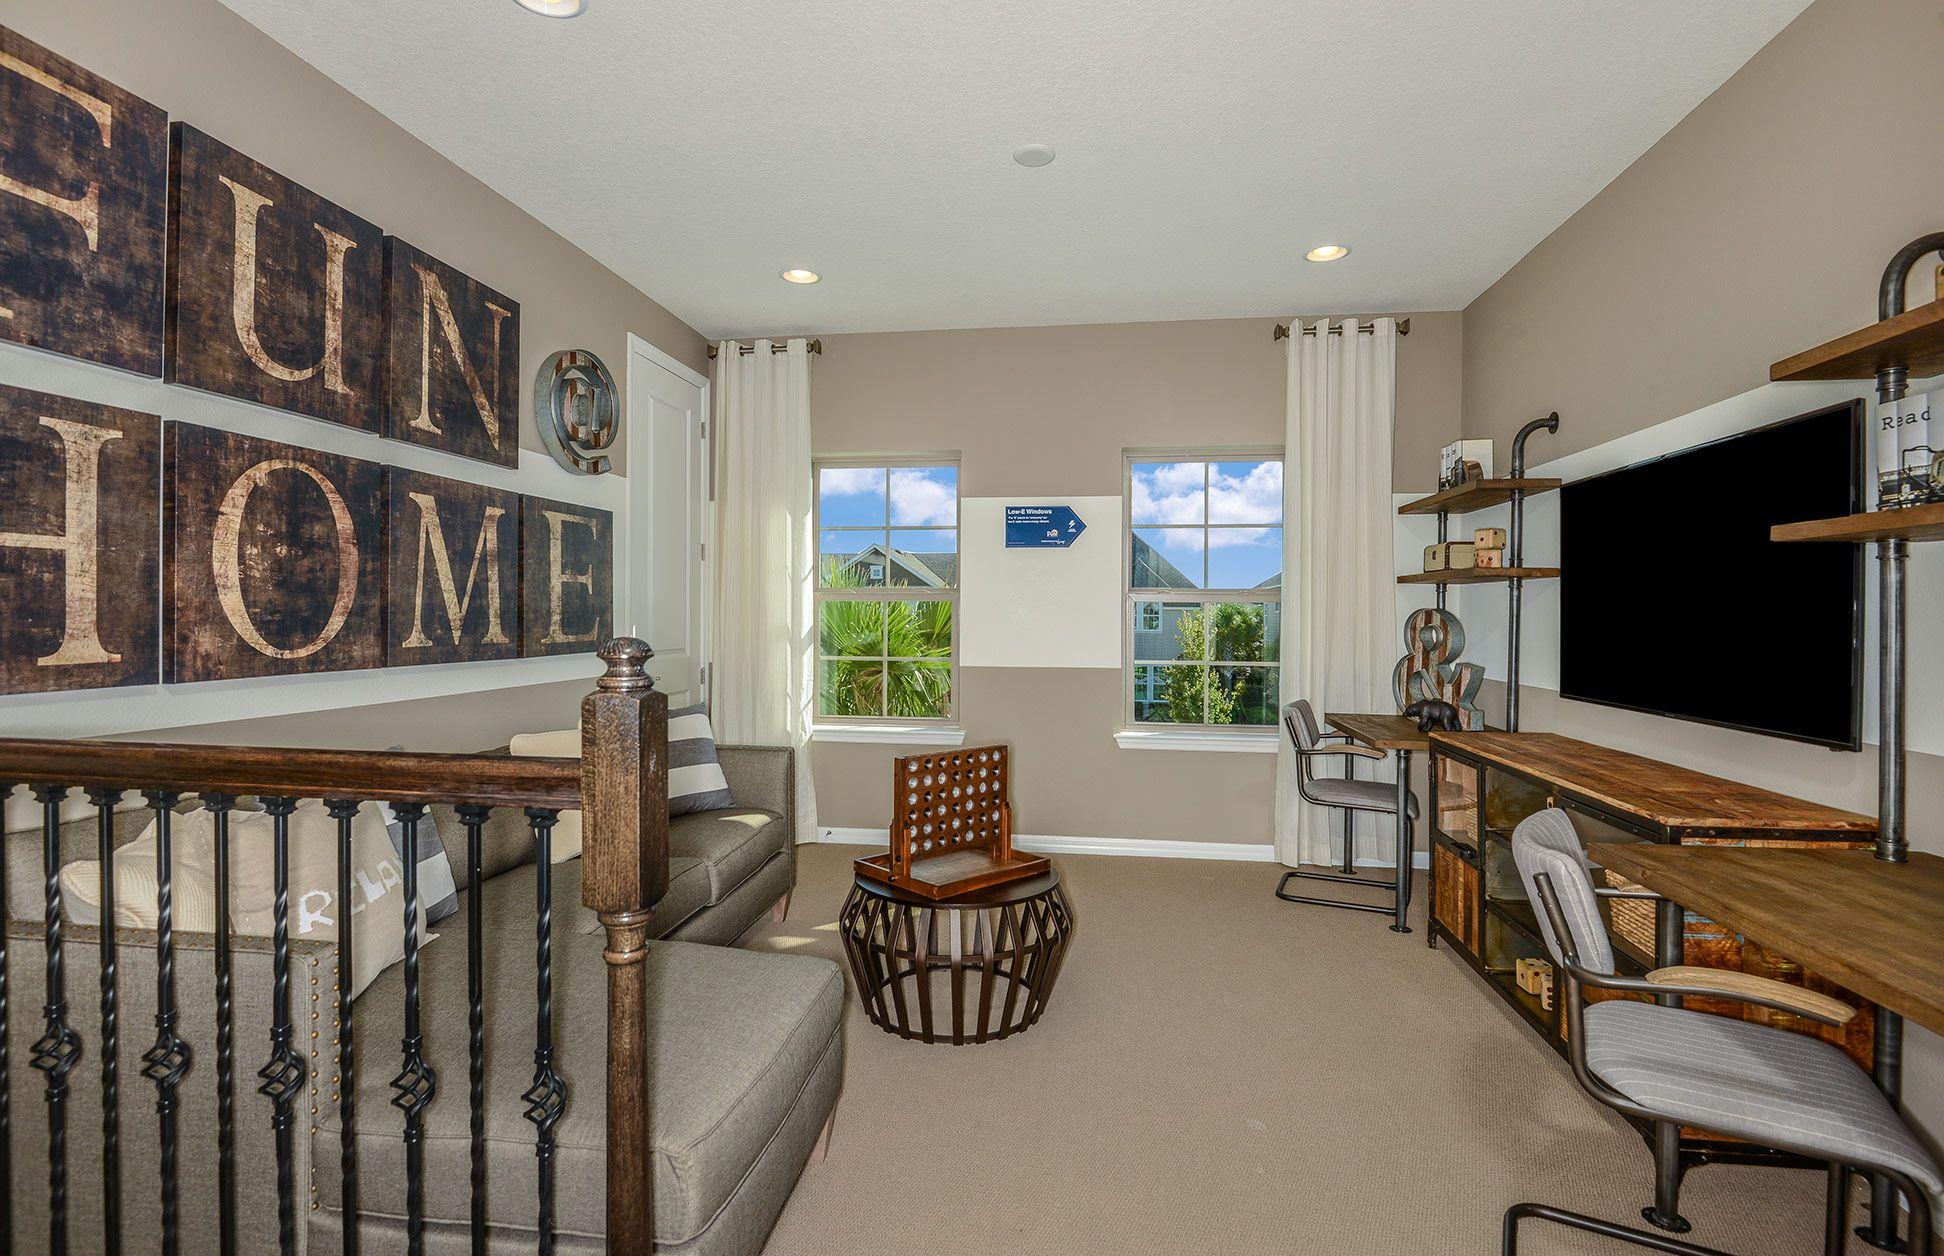 Loft 2Nd Family Room - Loftlounge - Pinterest - Lofts,